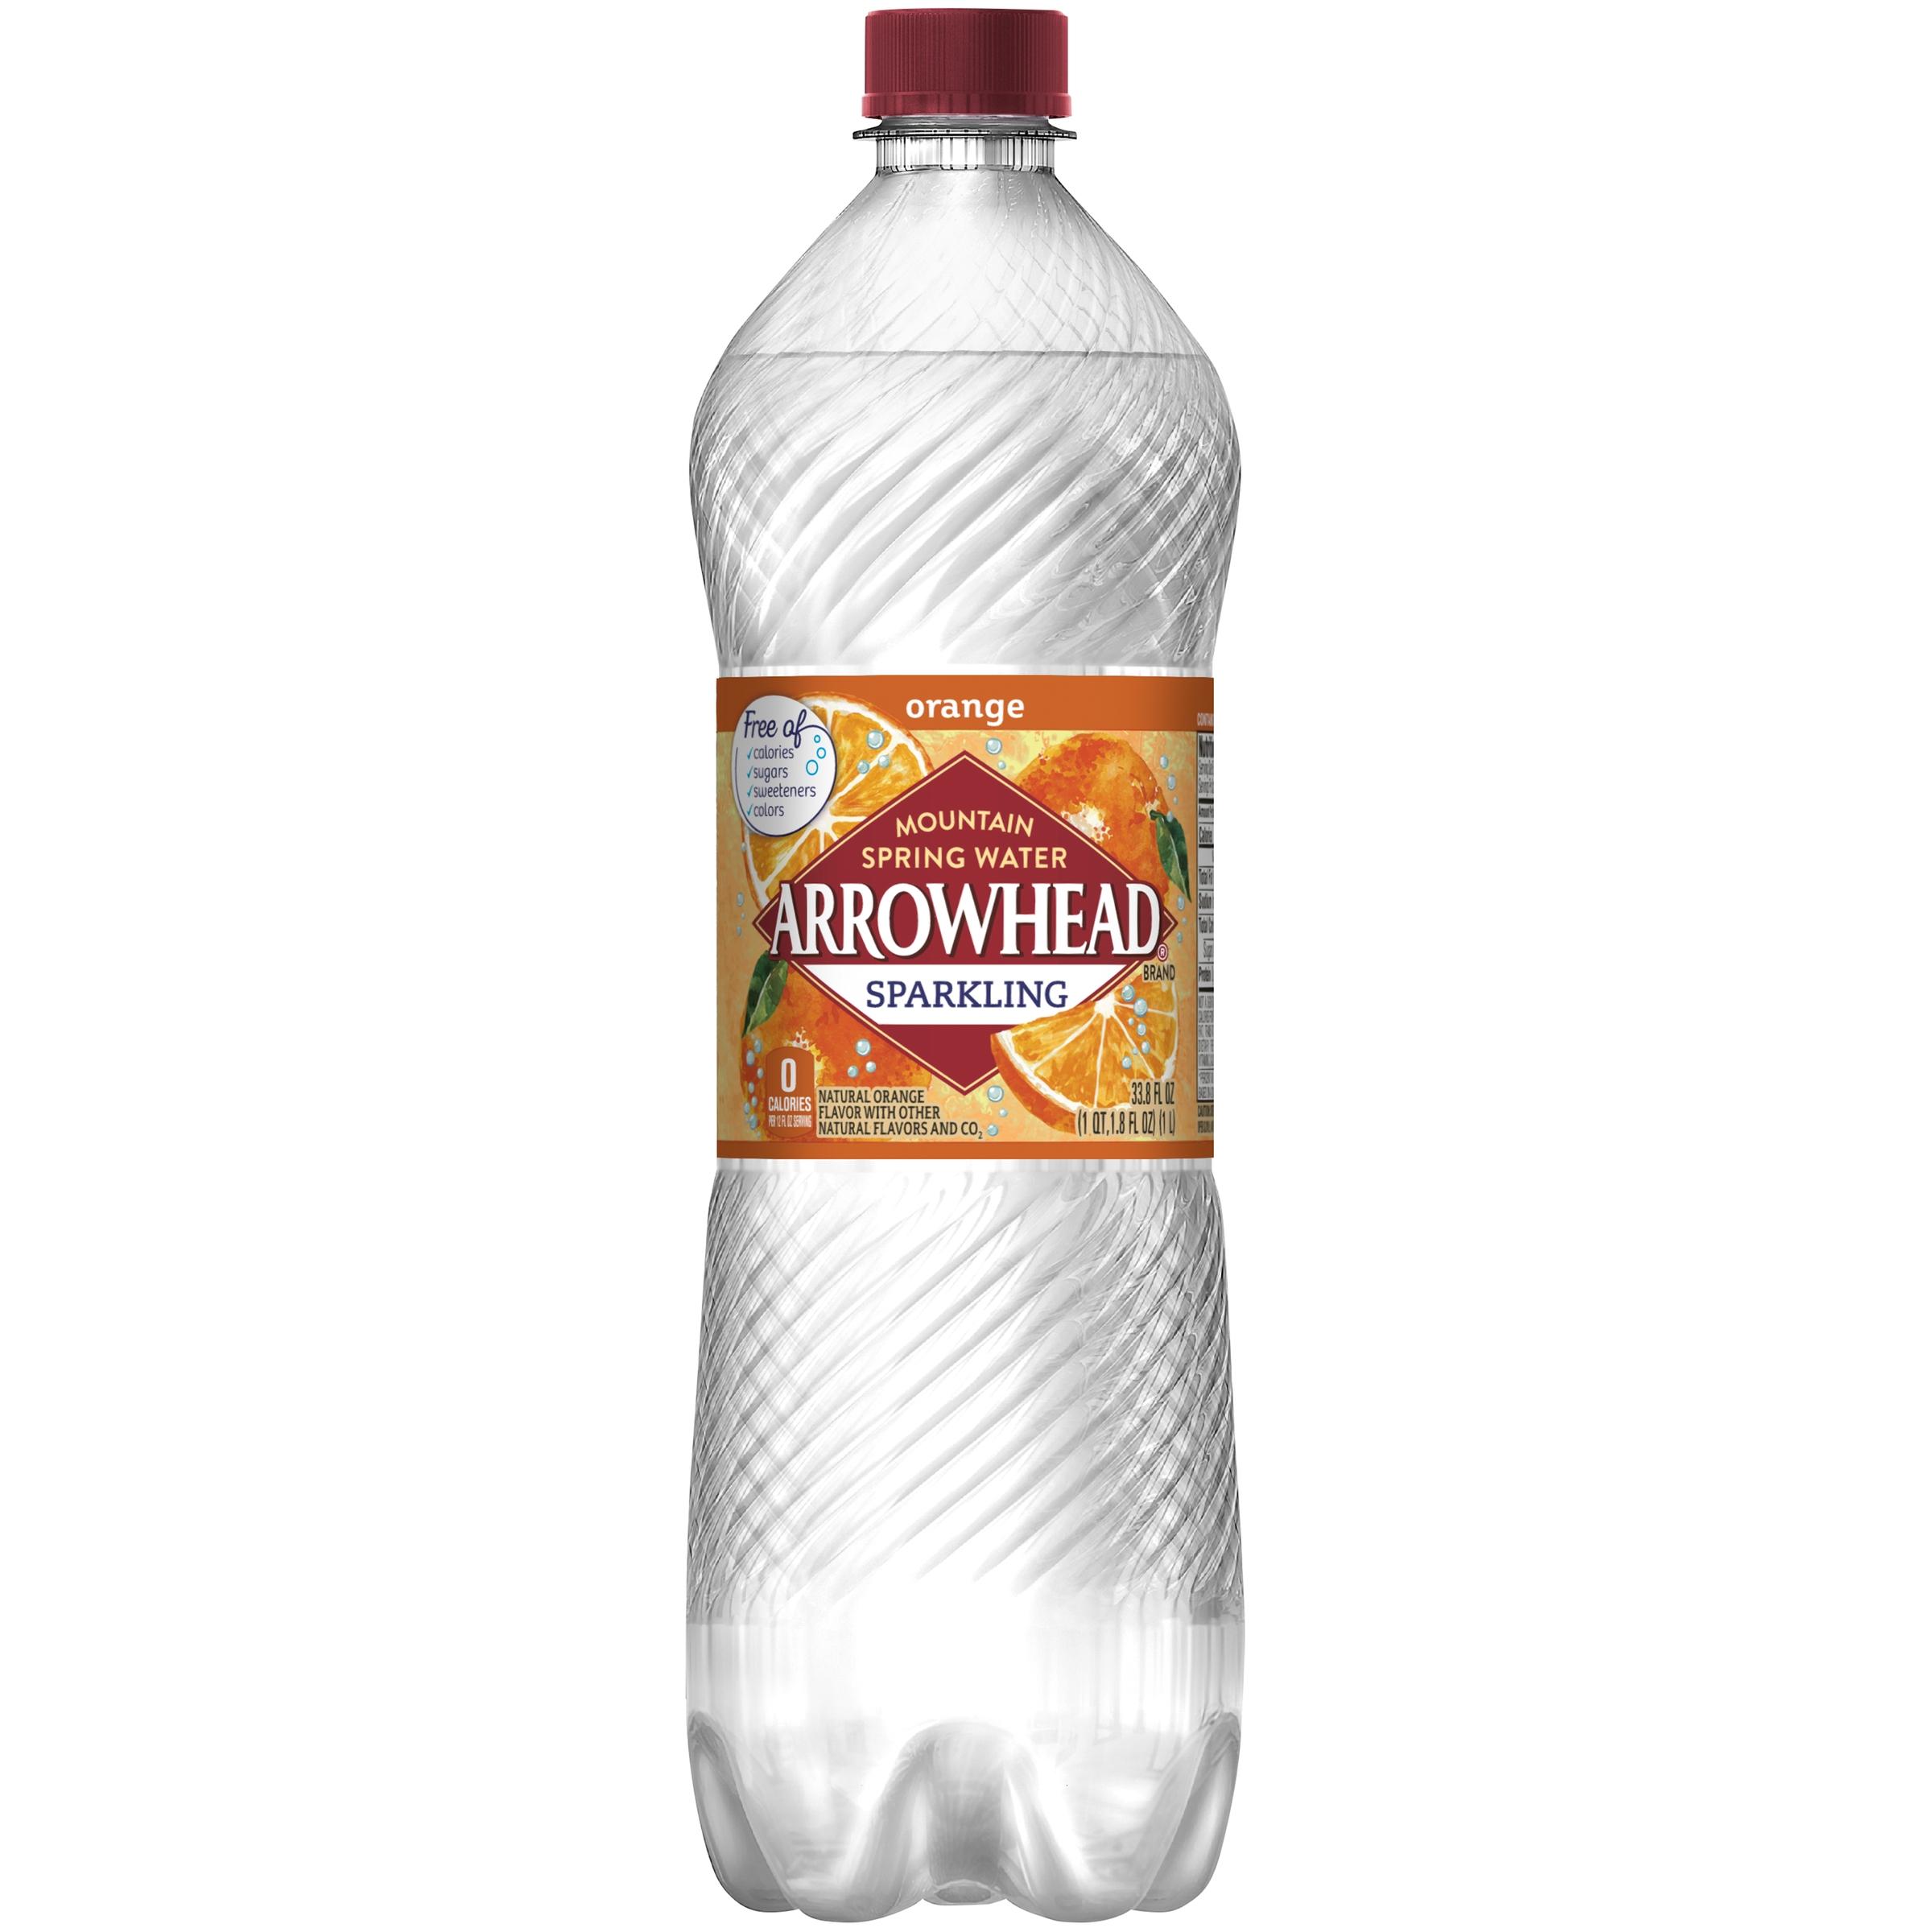 Arrowhead Orange Sparkling Water, 33.8 Fl. Oz.